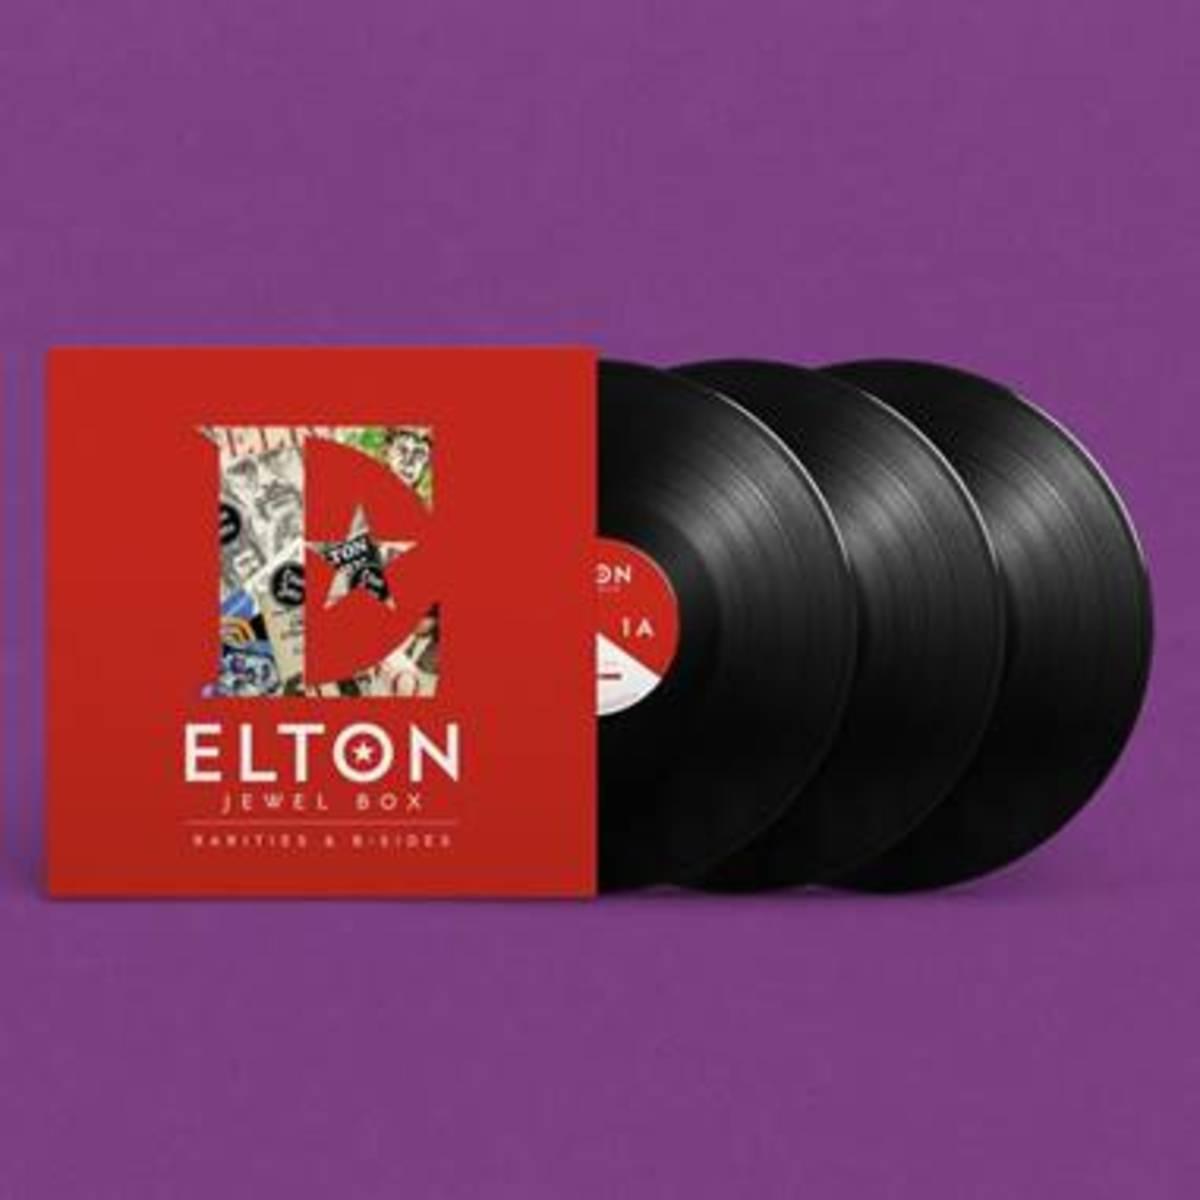 3LP Gatefold Black Vinyl